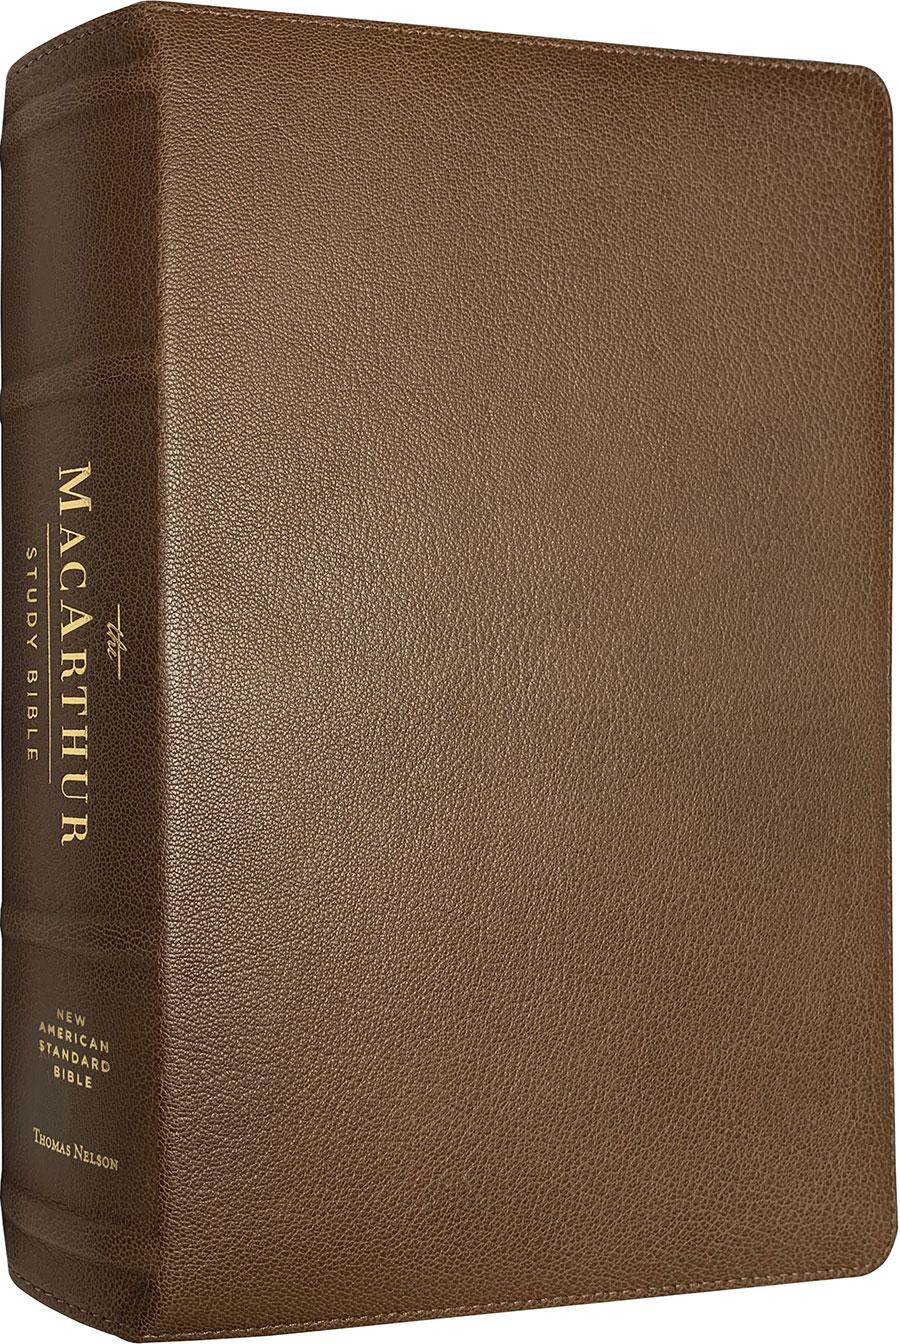 NAS MacArthur Study Bible (Second Edition) (Premium Leather)